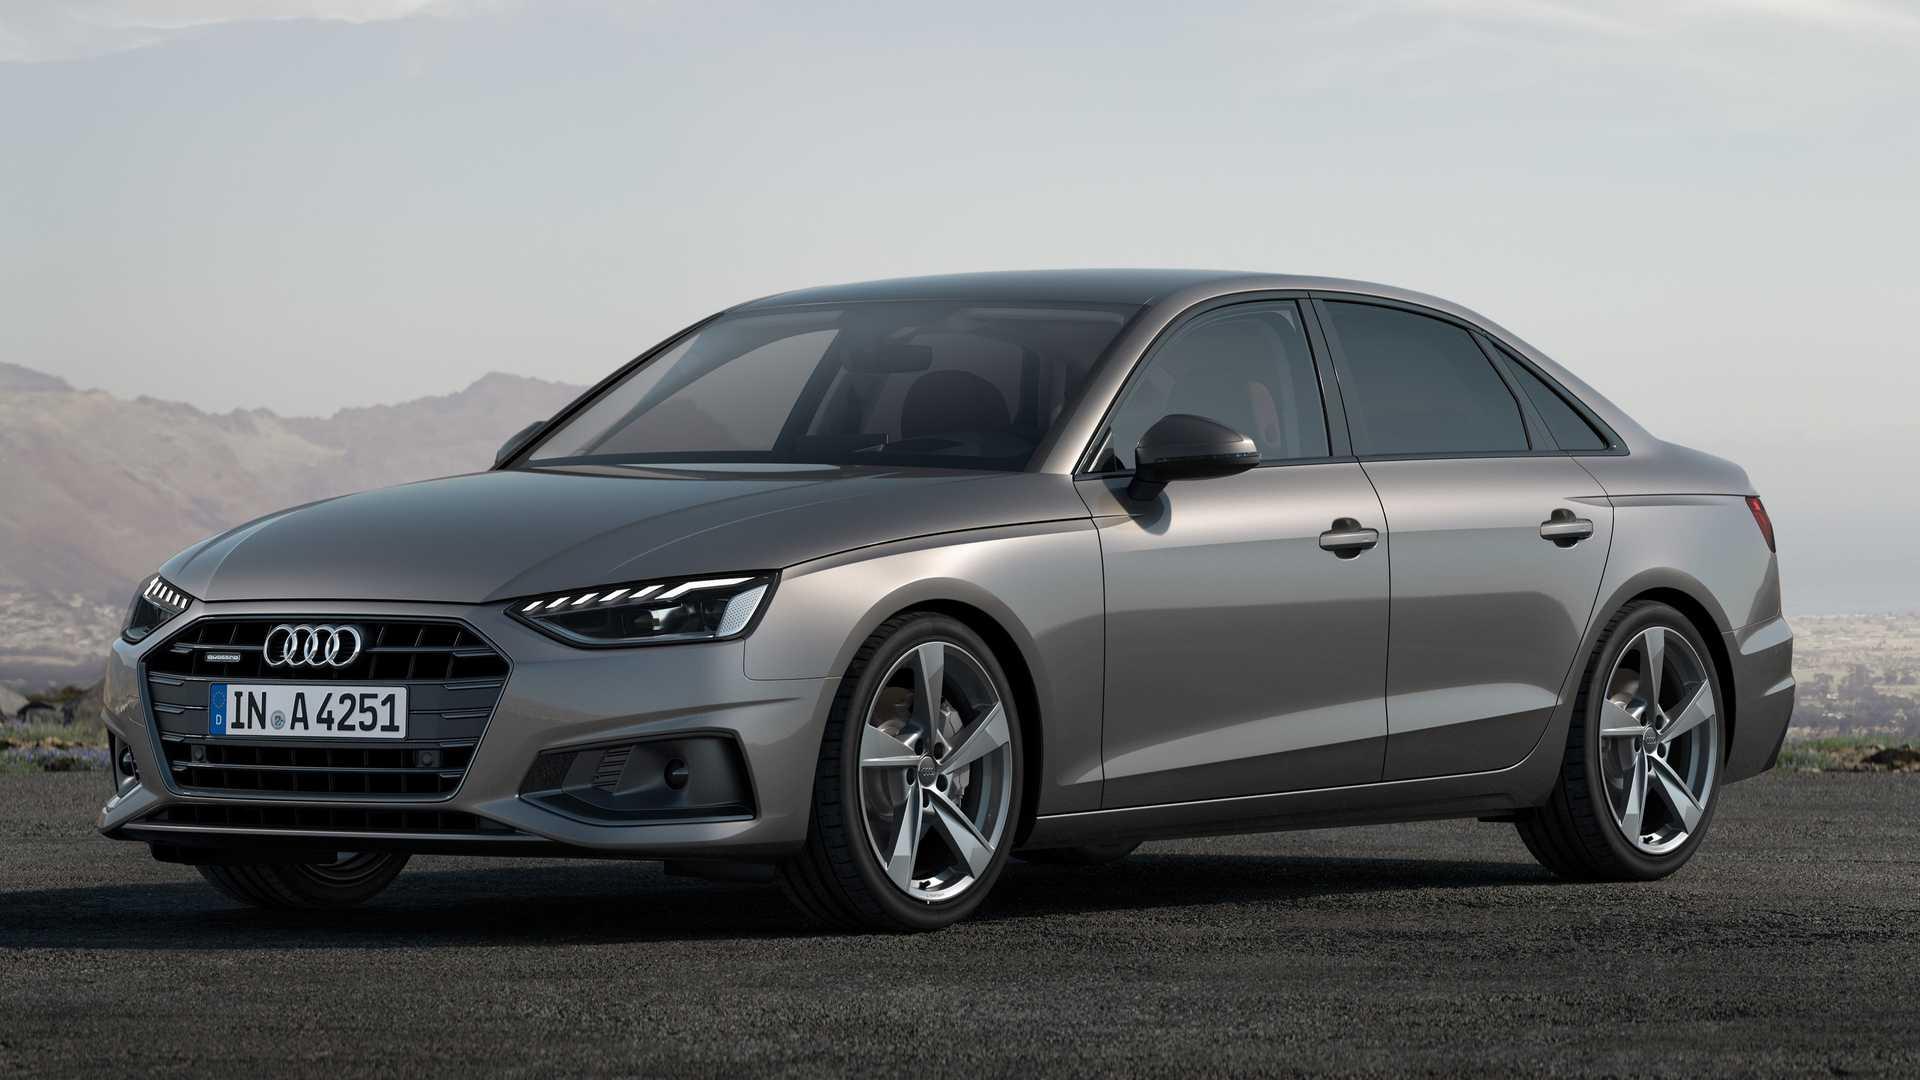 77 All New Audi A4 B10 2020 Configurations by Audi A4 B10 2020